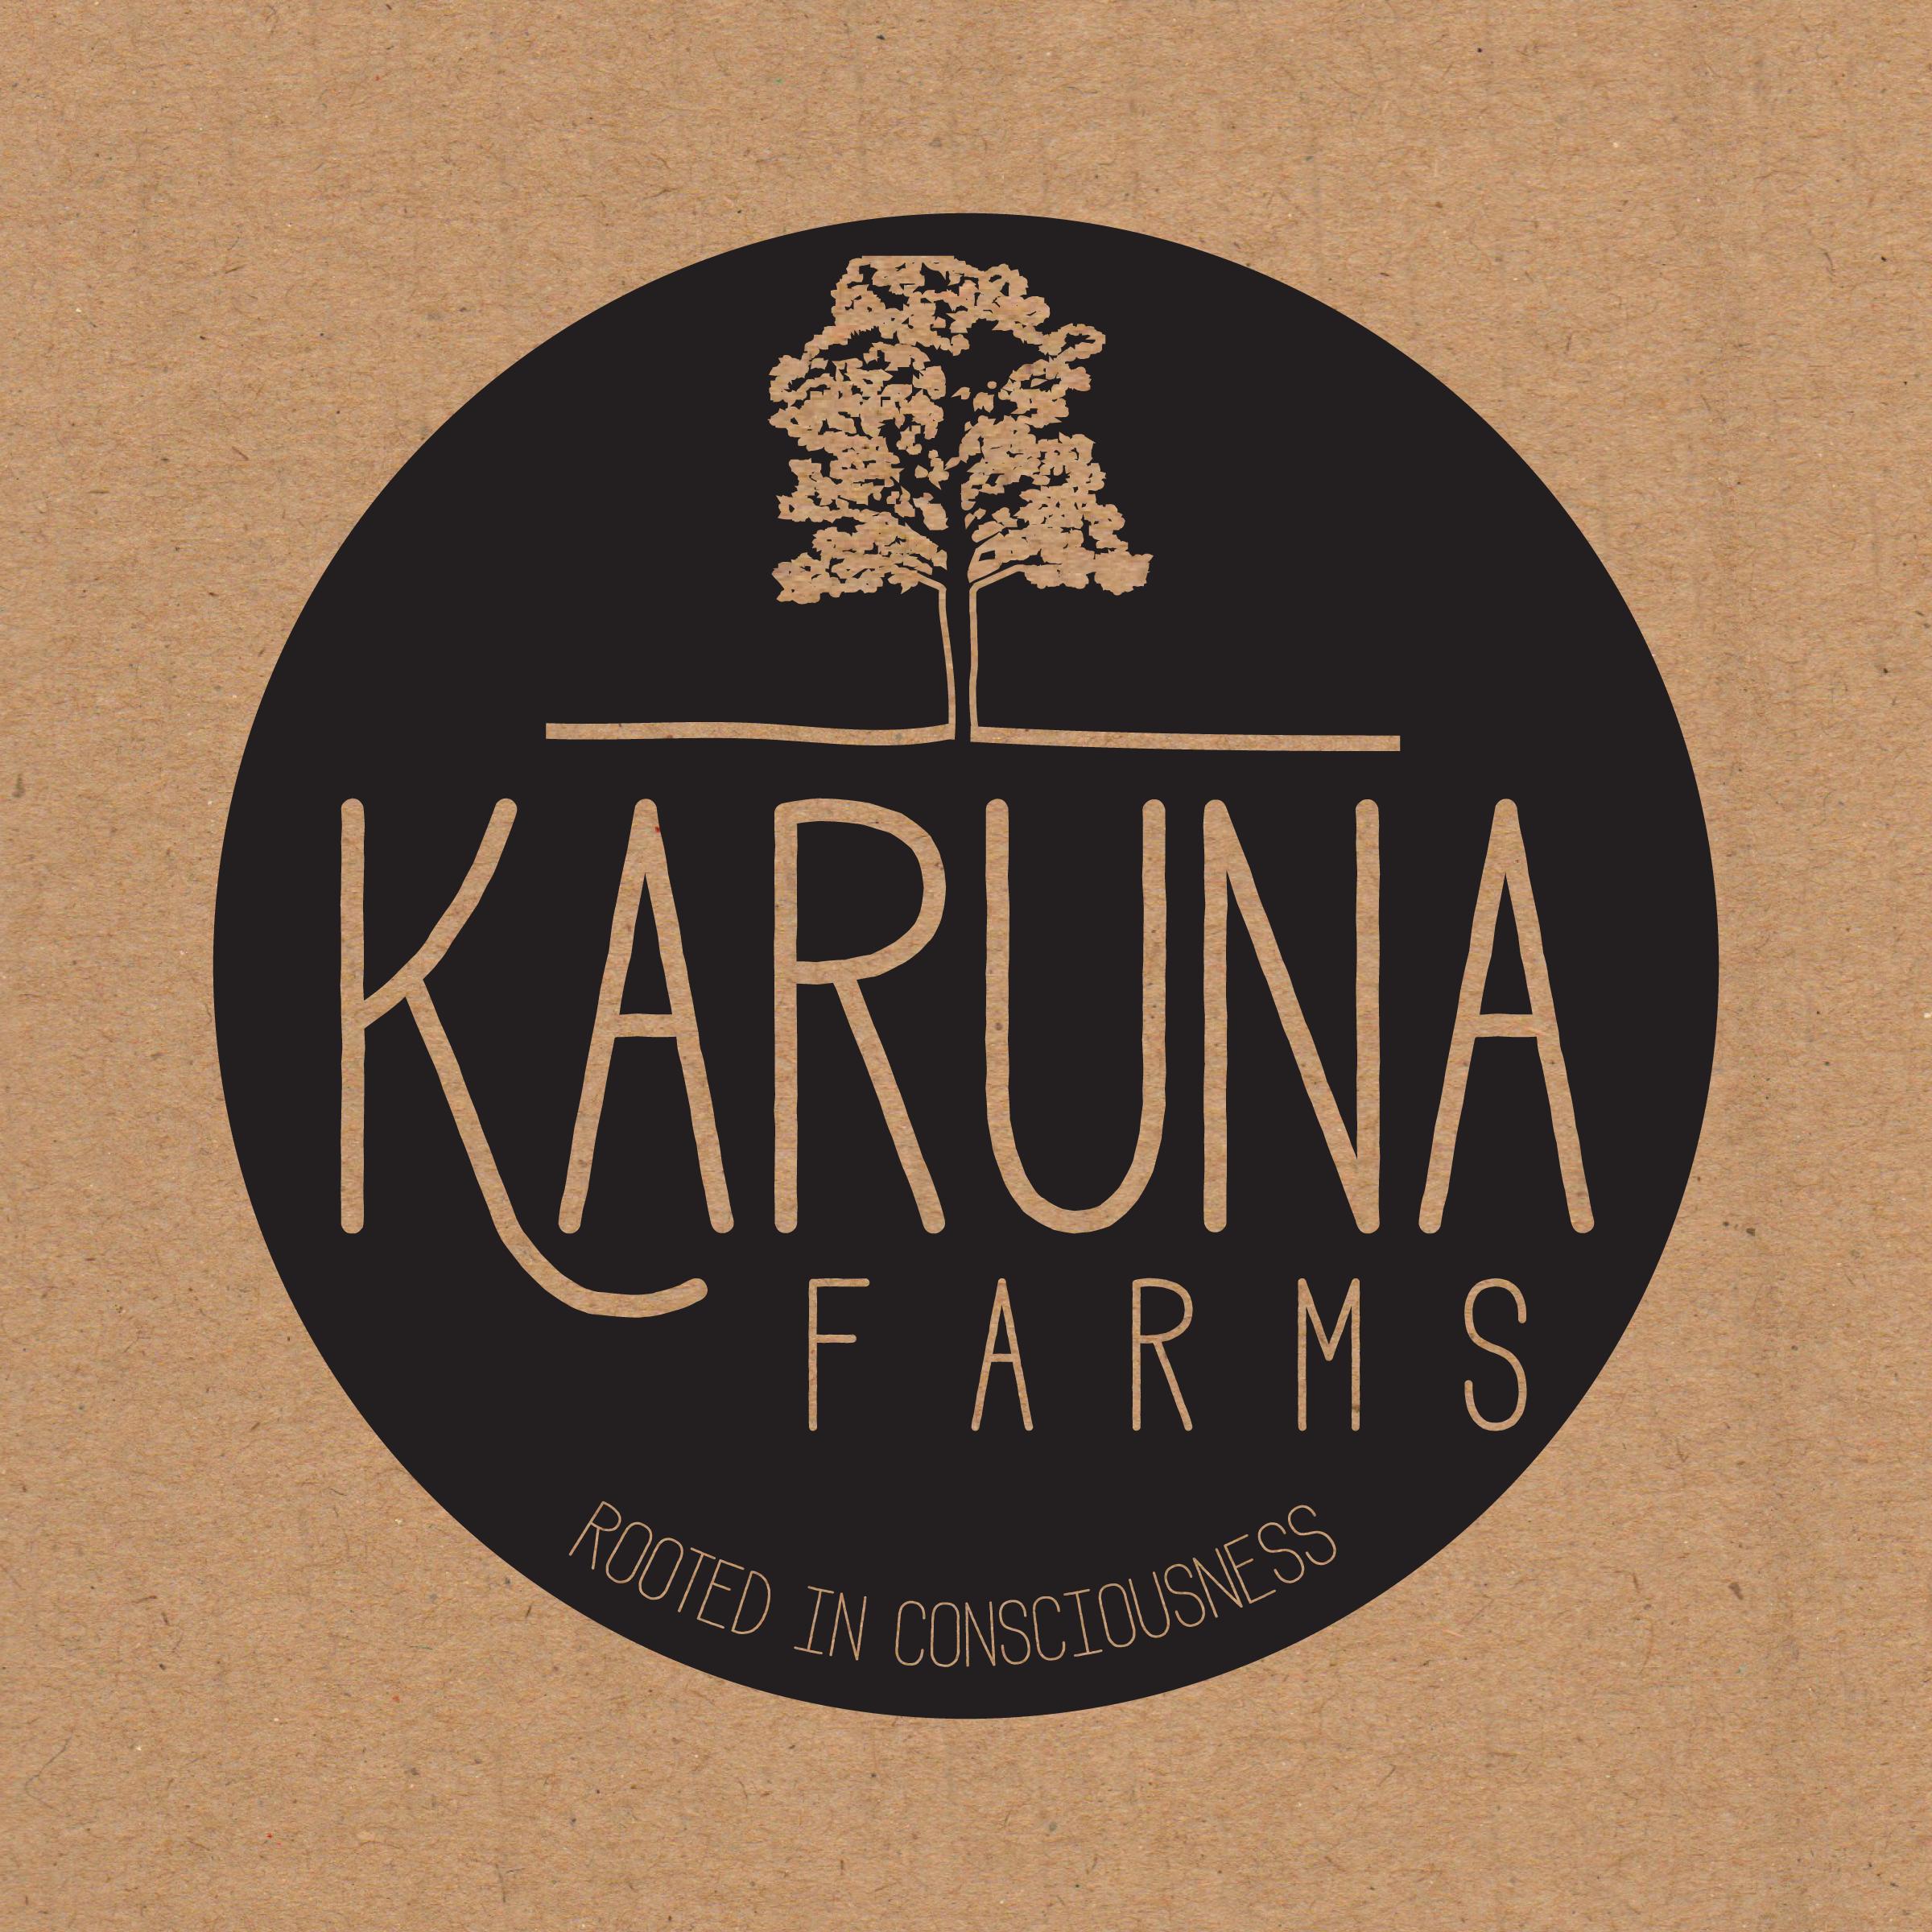 Karuna-Farms-Logo-2-1.png